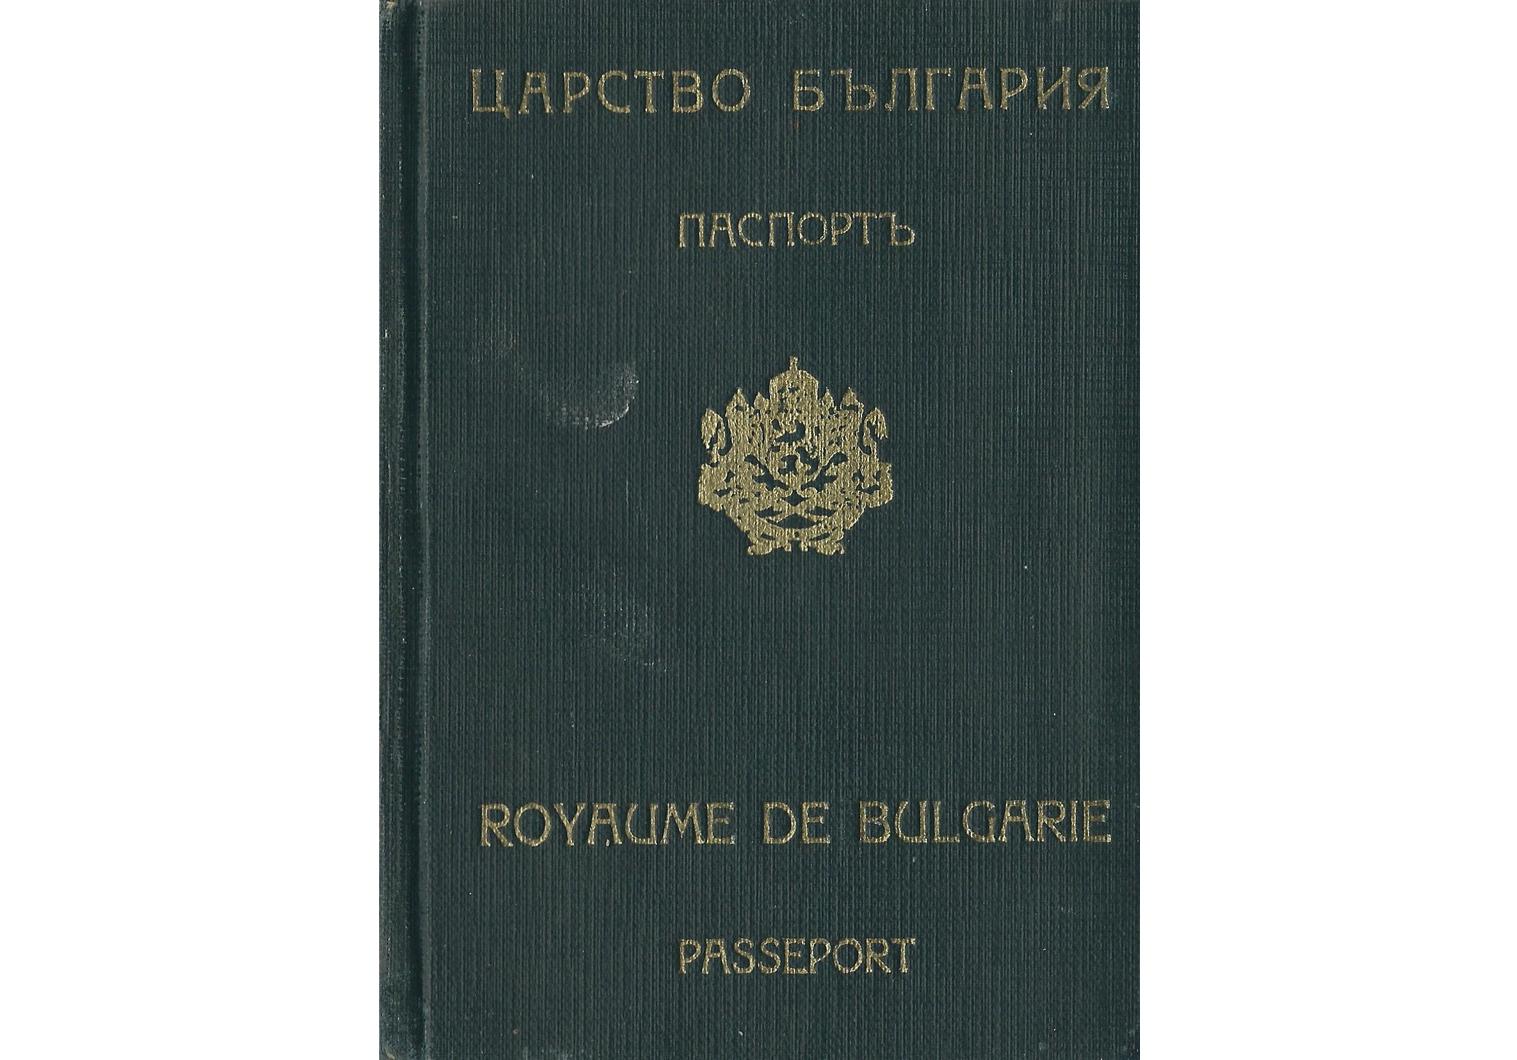 1945 women's international conference passport